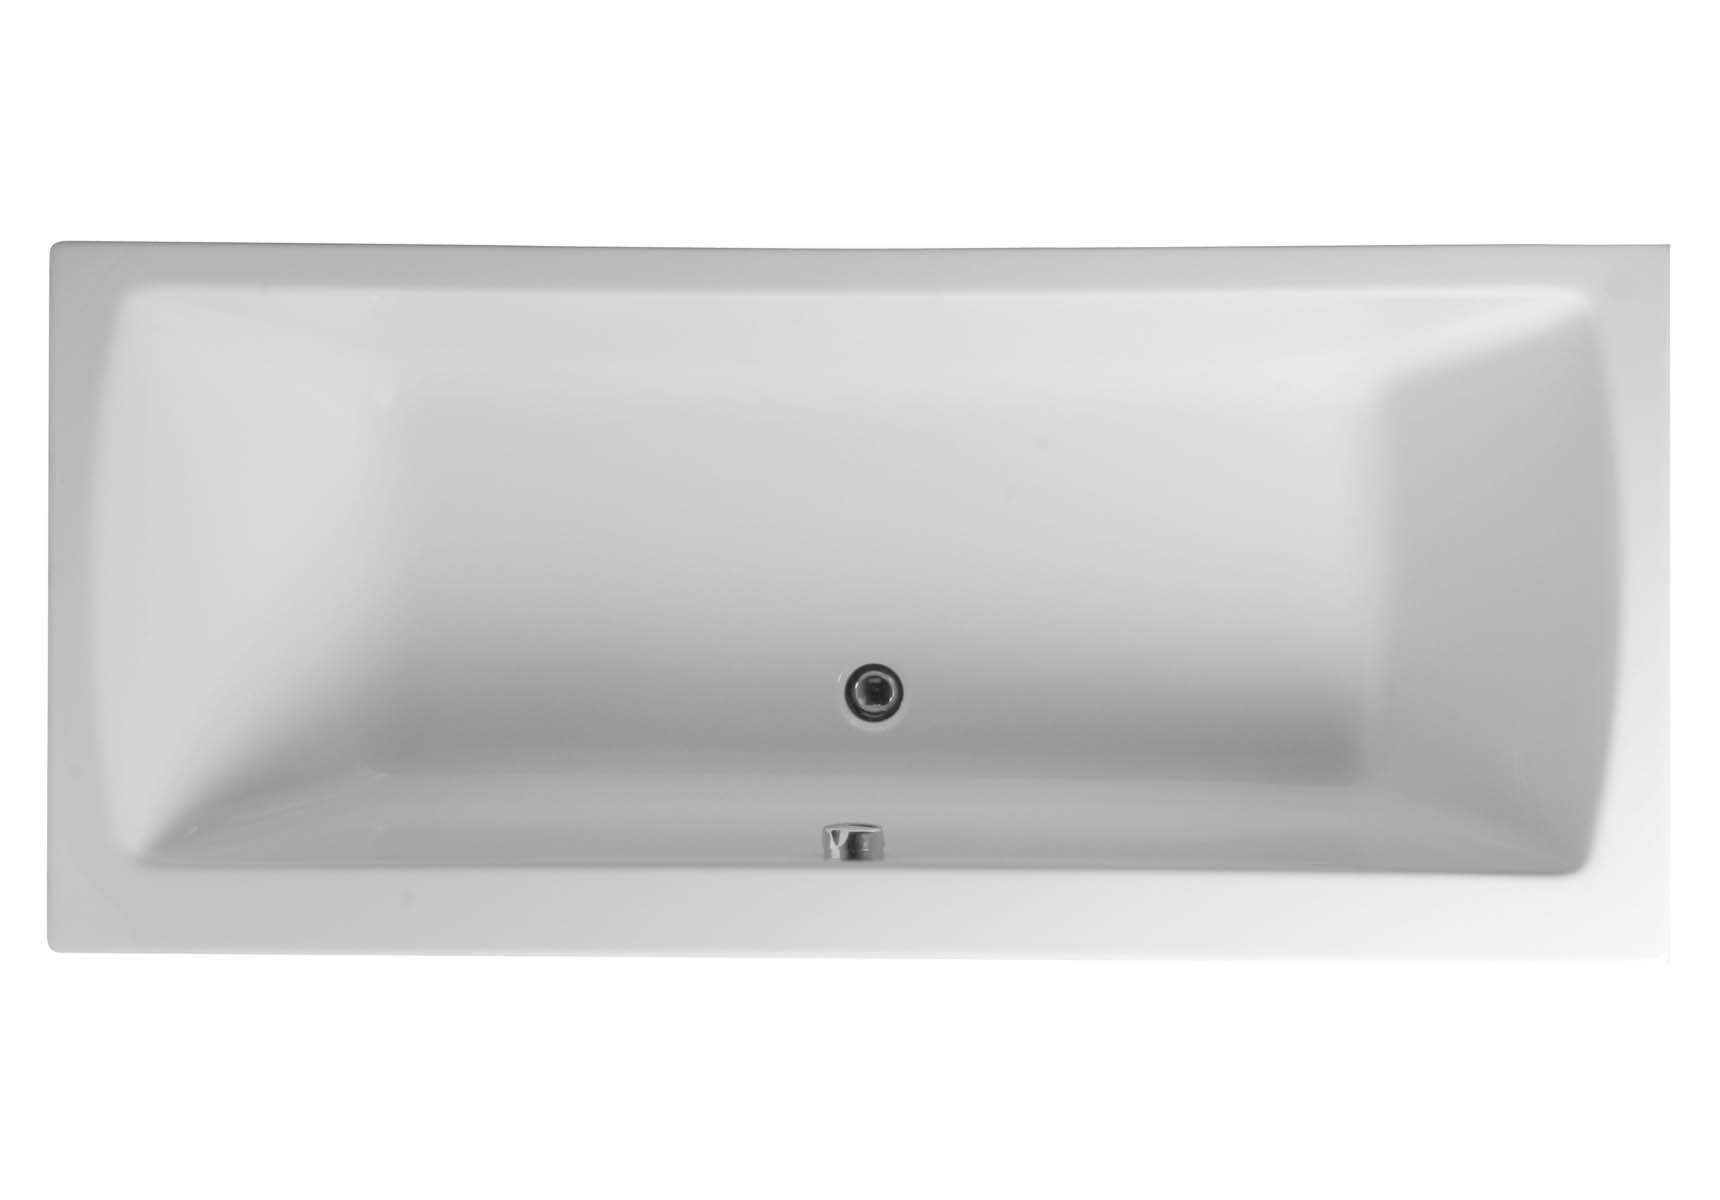 Neon 180x100 cm Rectangular/Double Ended Bathtub